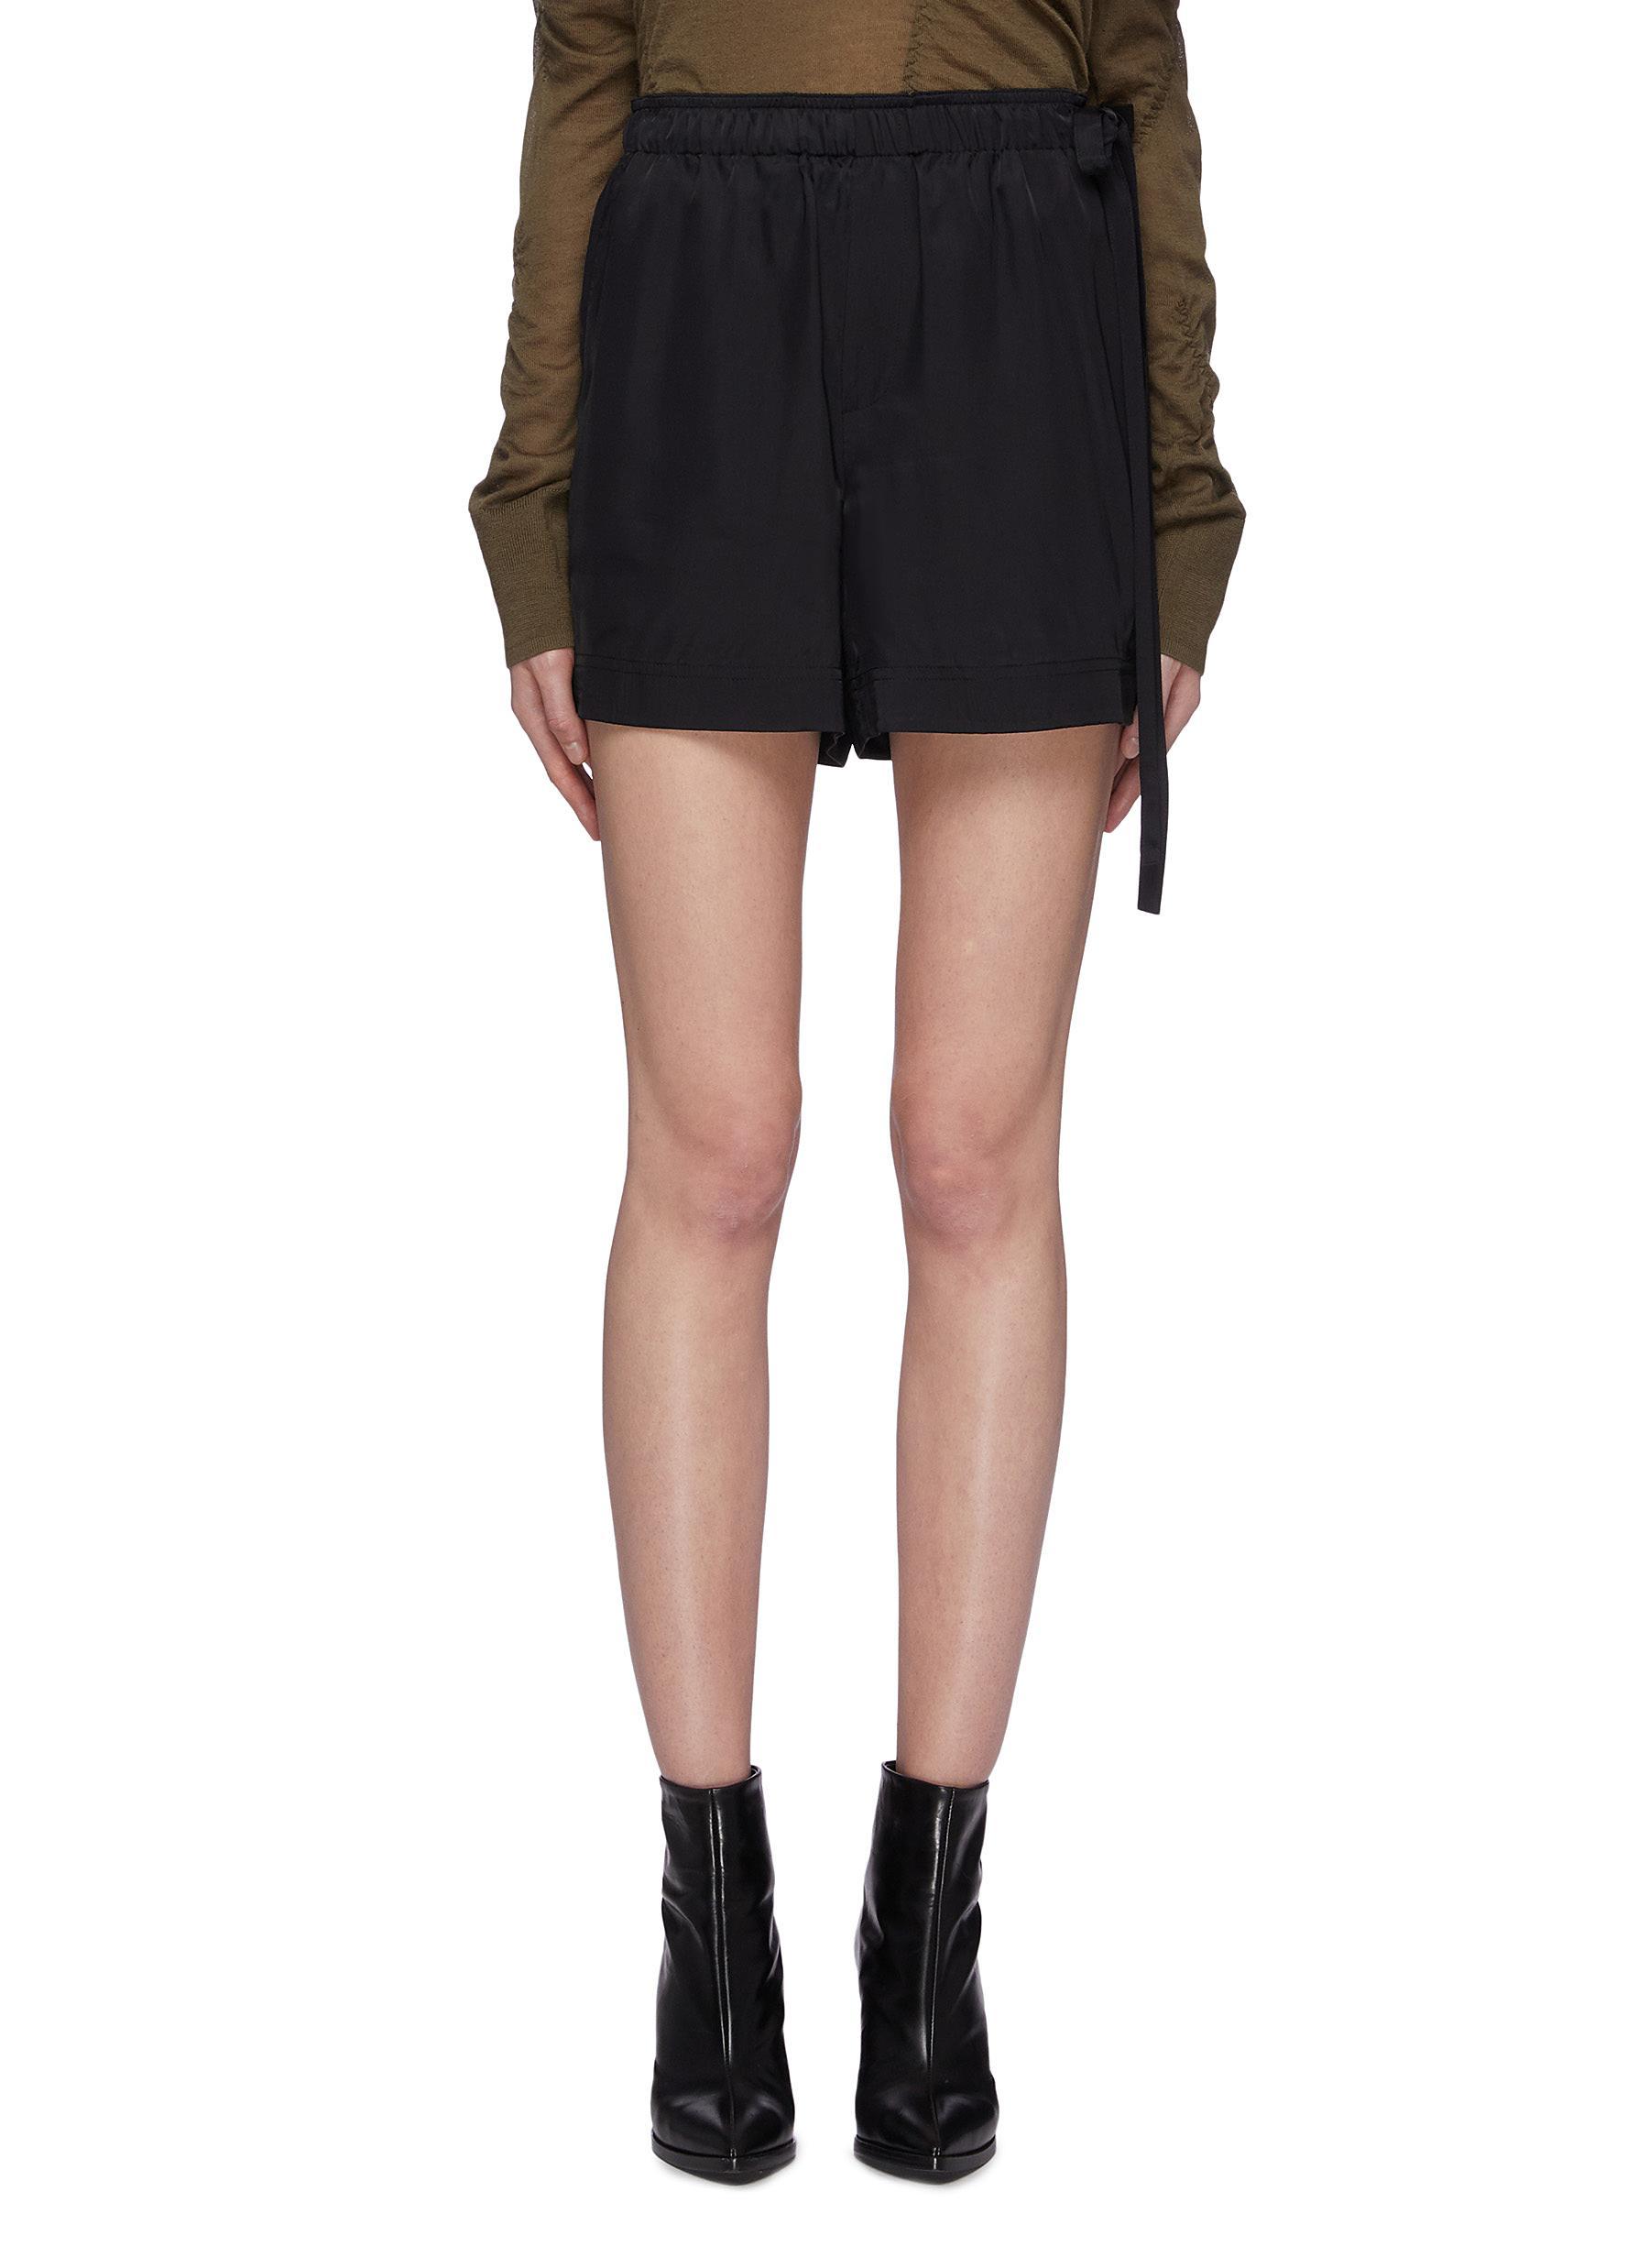 Side drawstring shorts by Helmut Lang